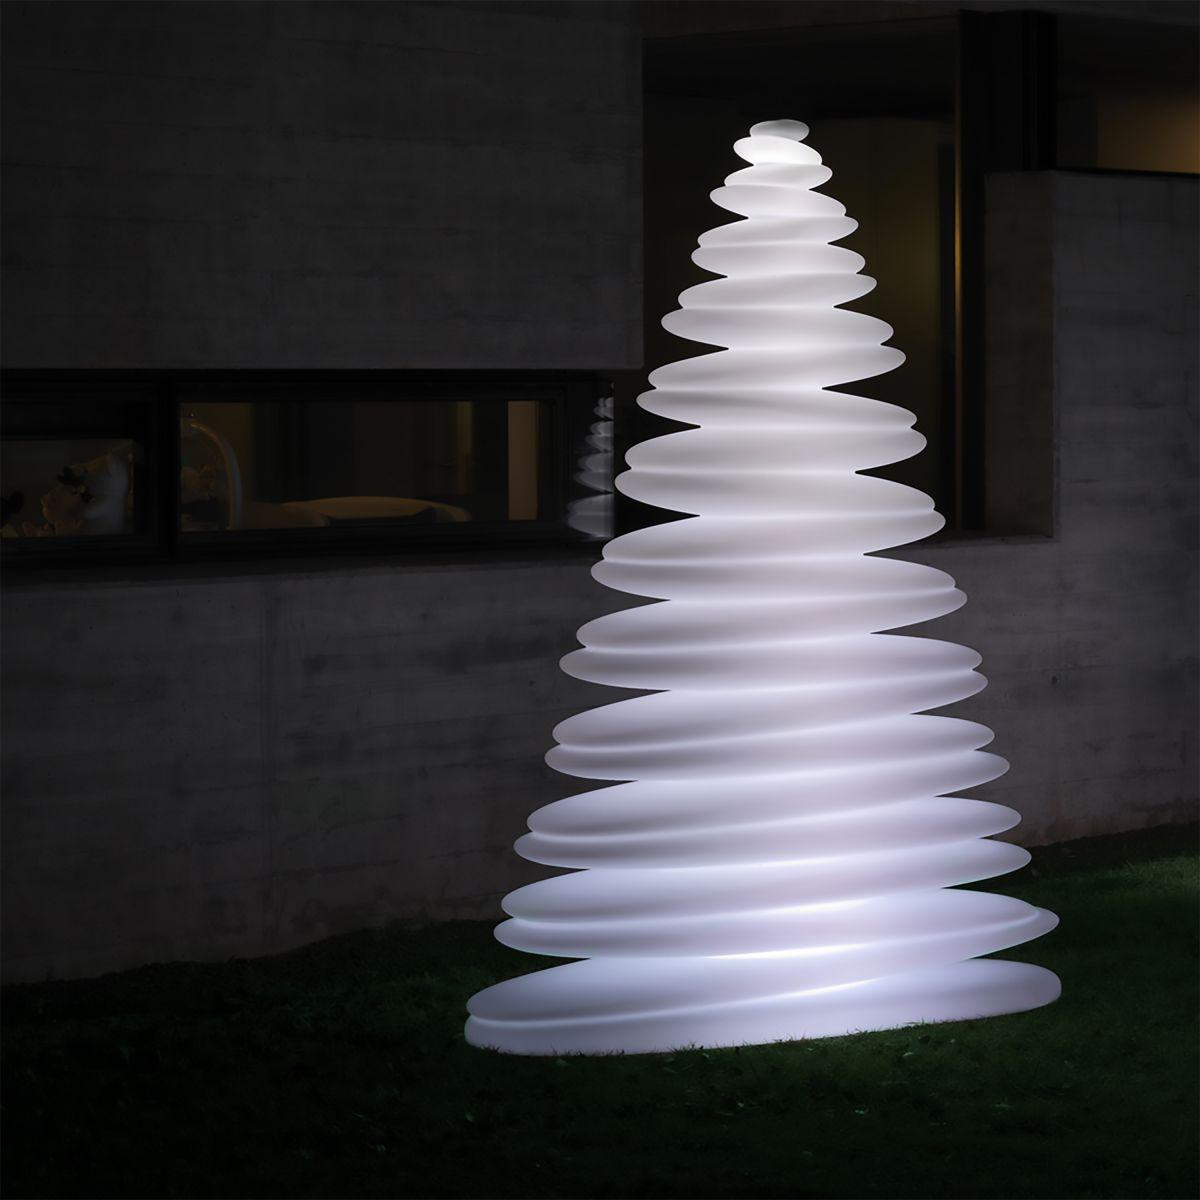 sapin de noel lumineux design